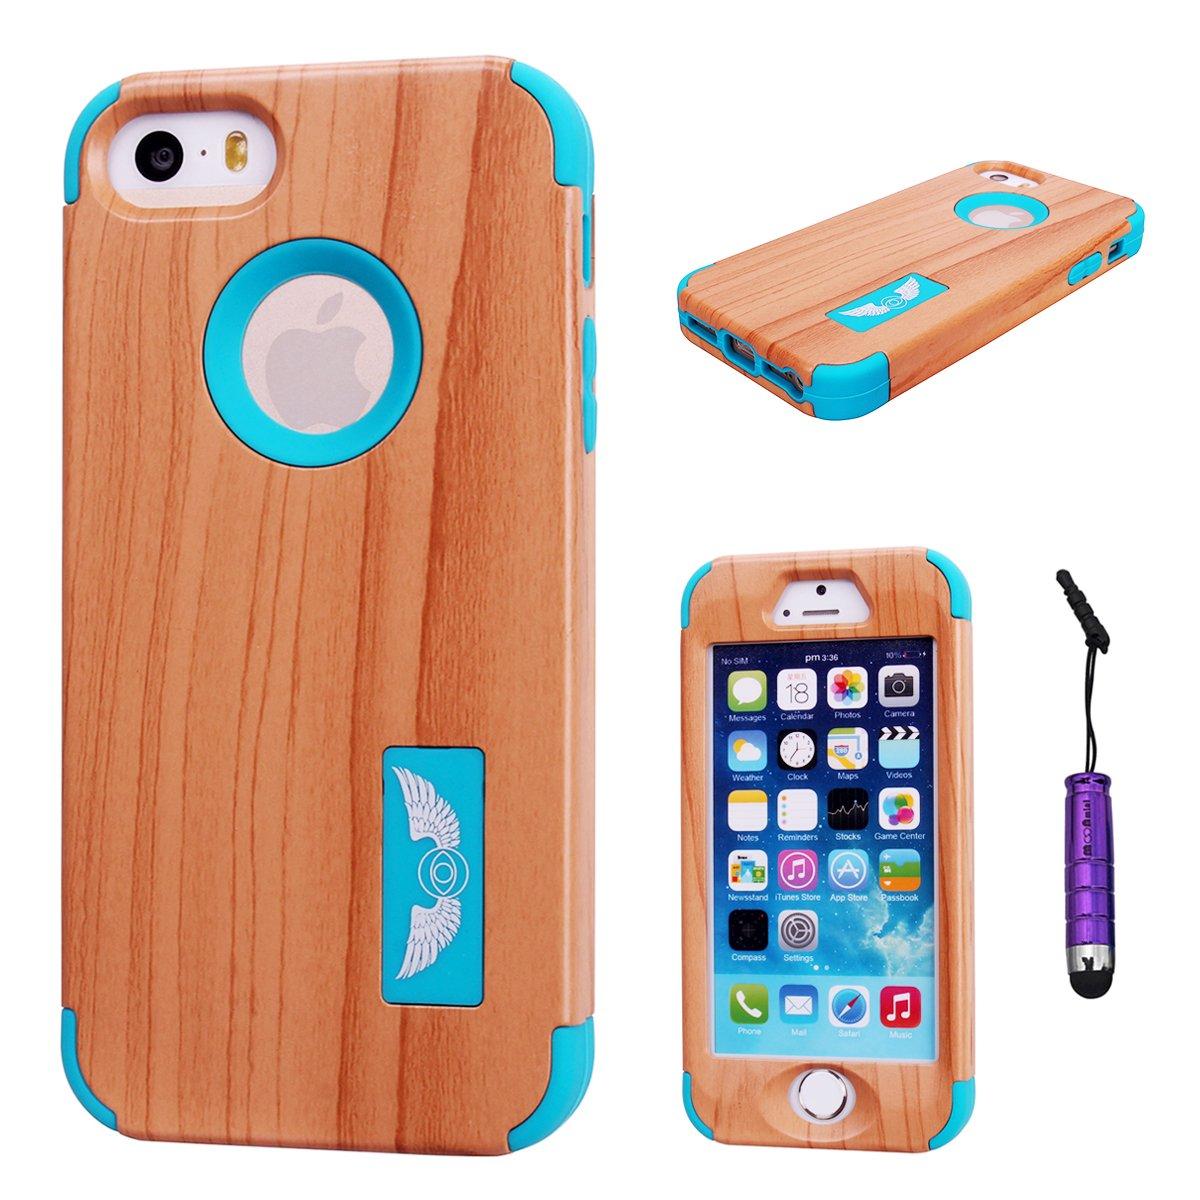 amazon com apple iphone 5g apple iphone 5g case basicstock max